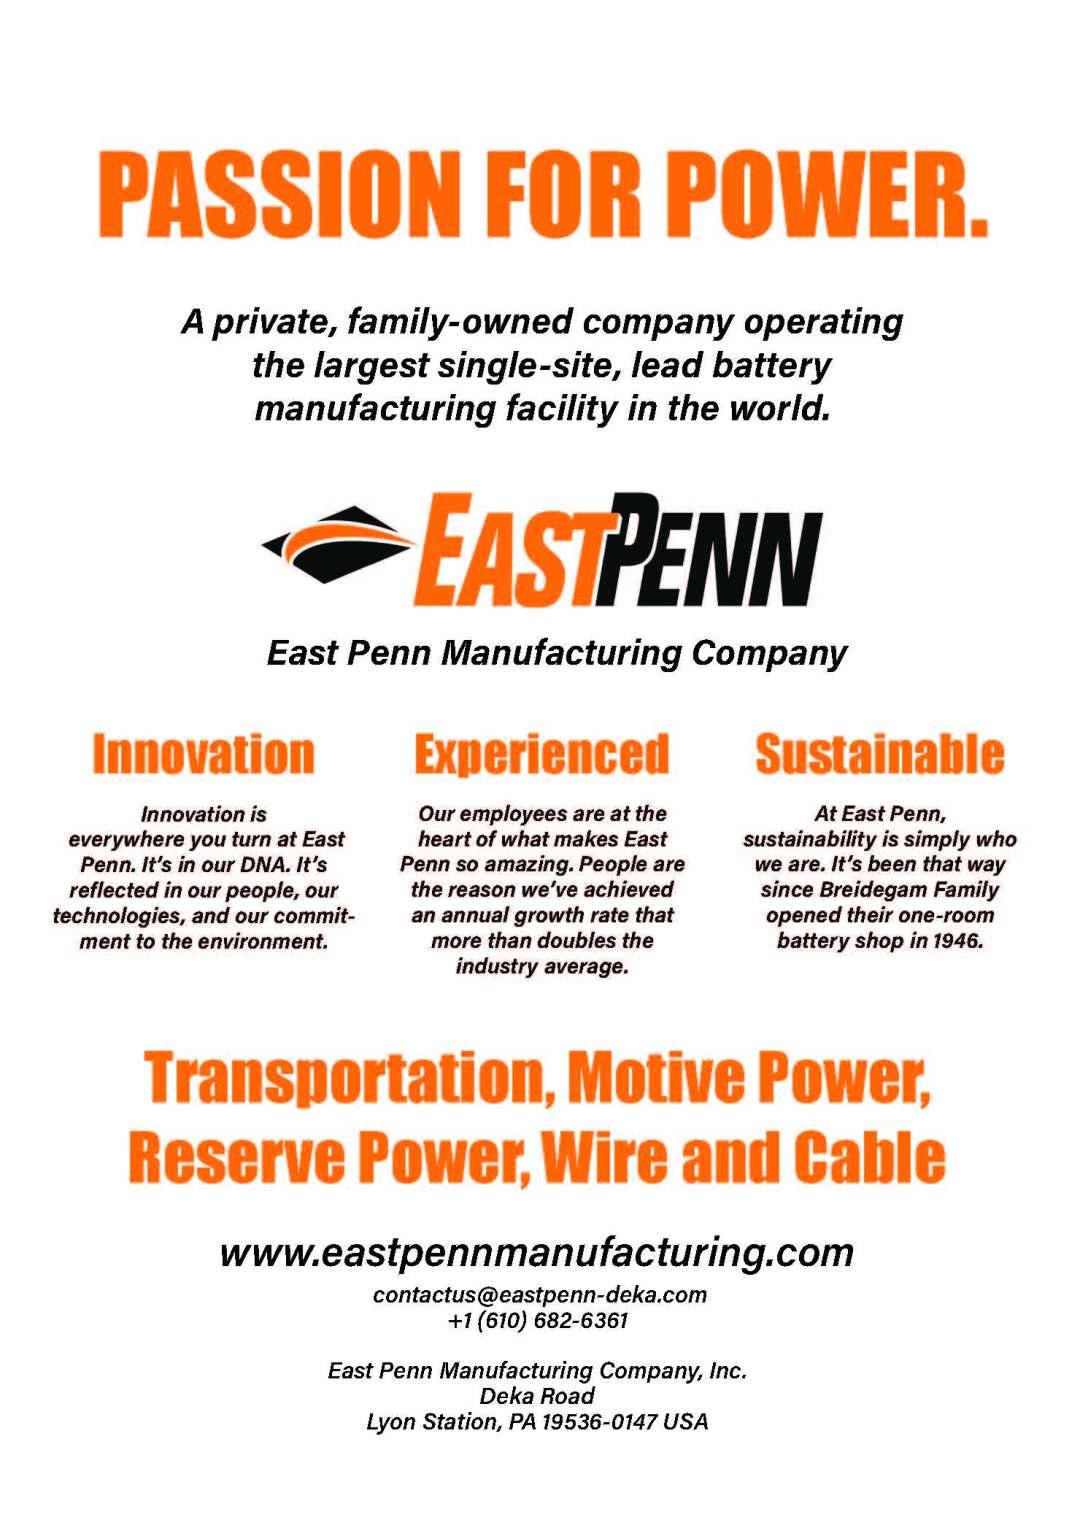 east penn adx